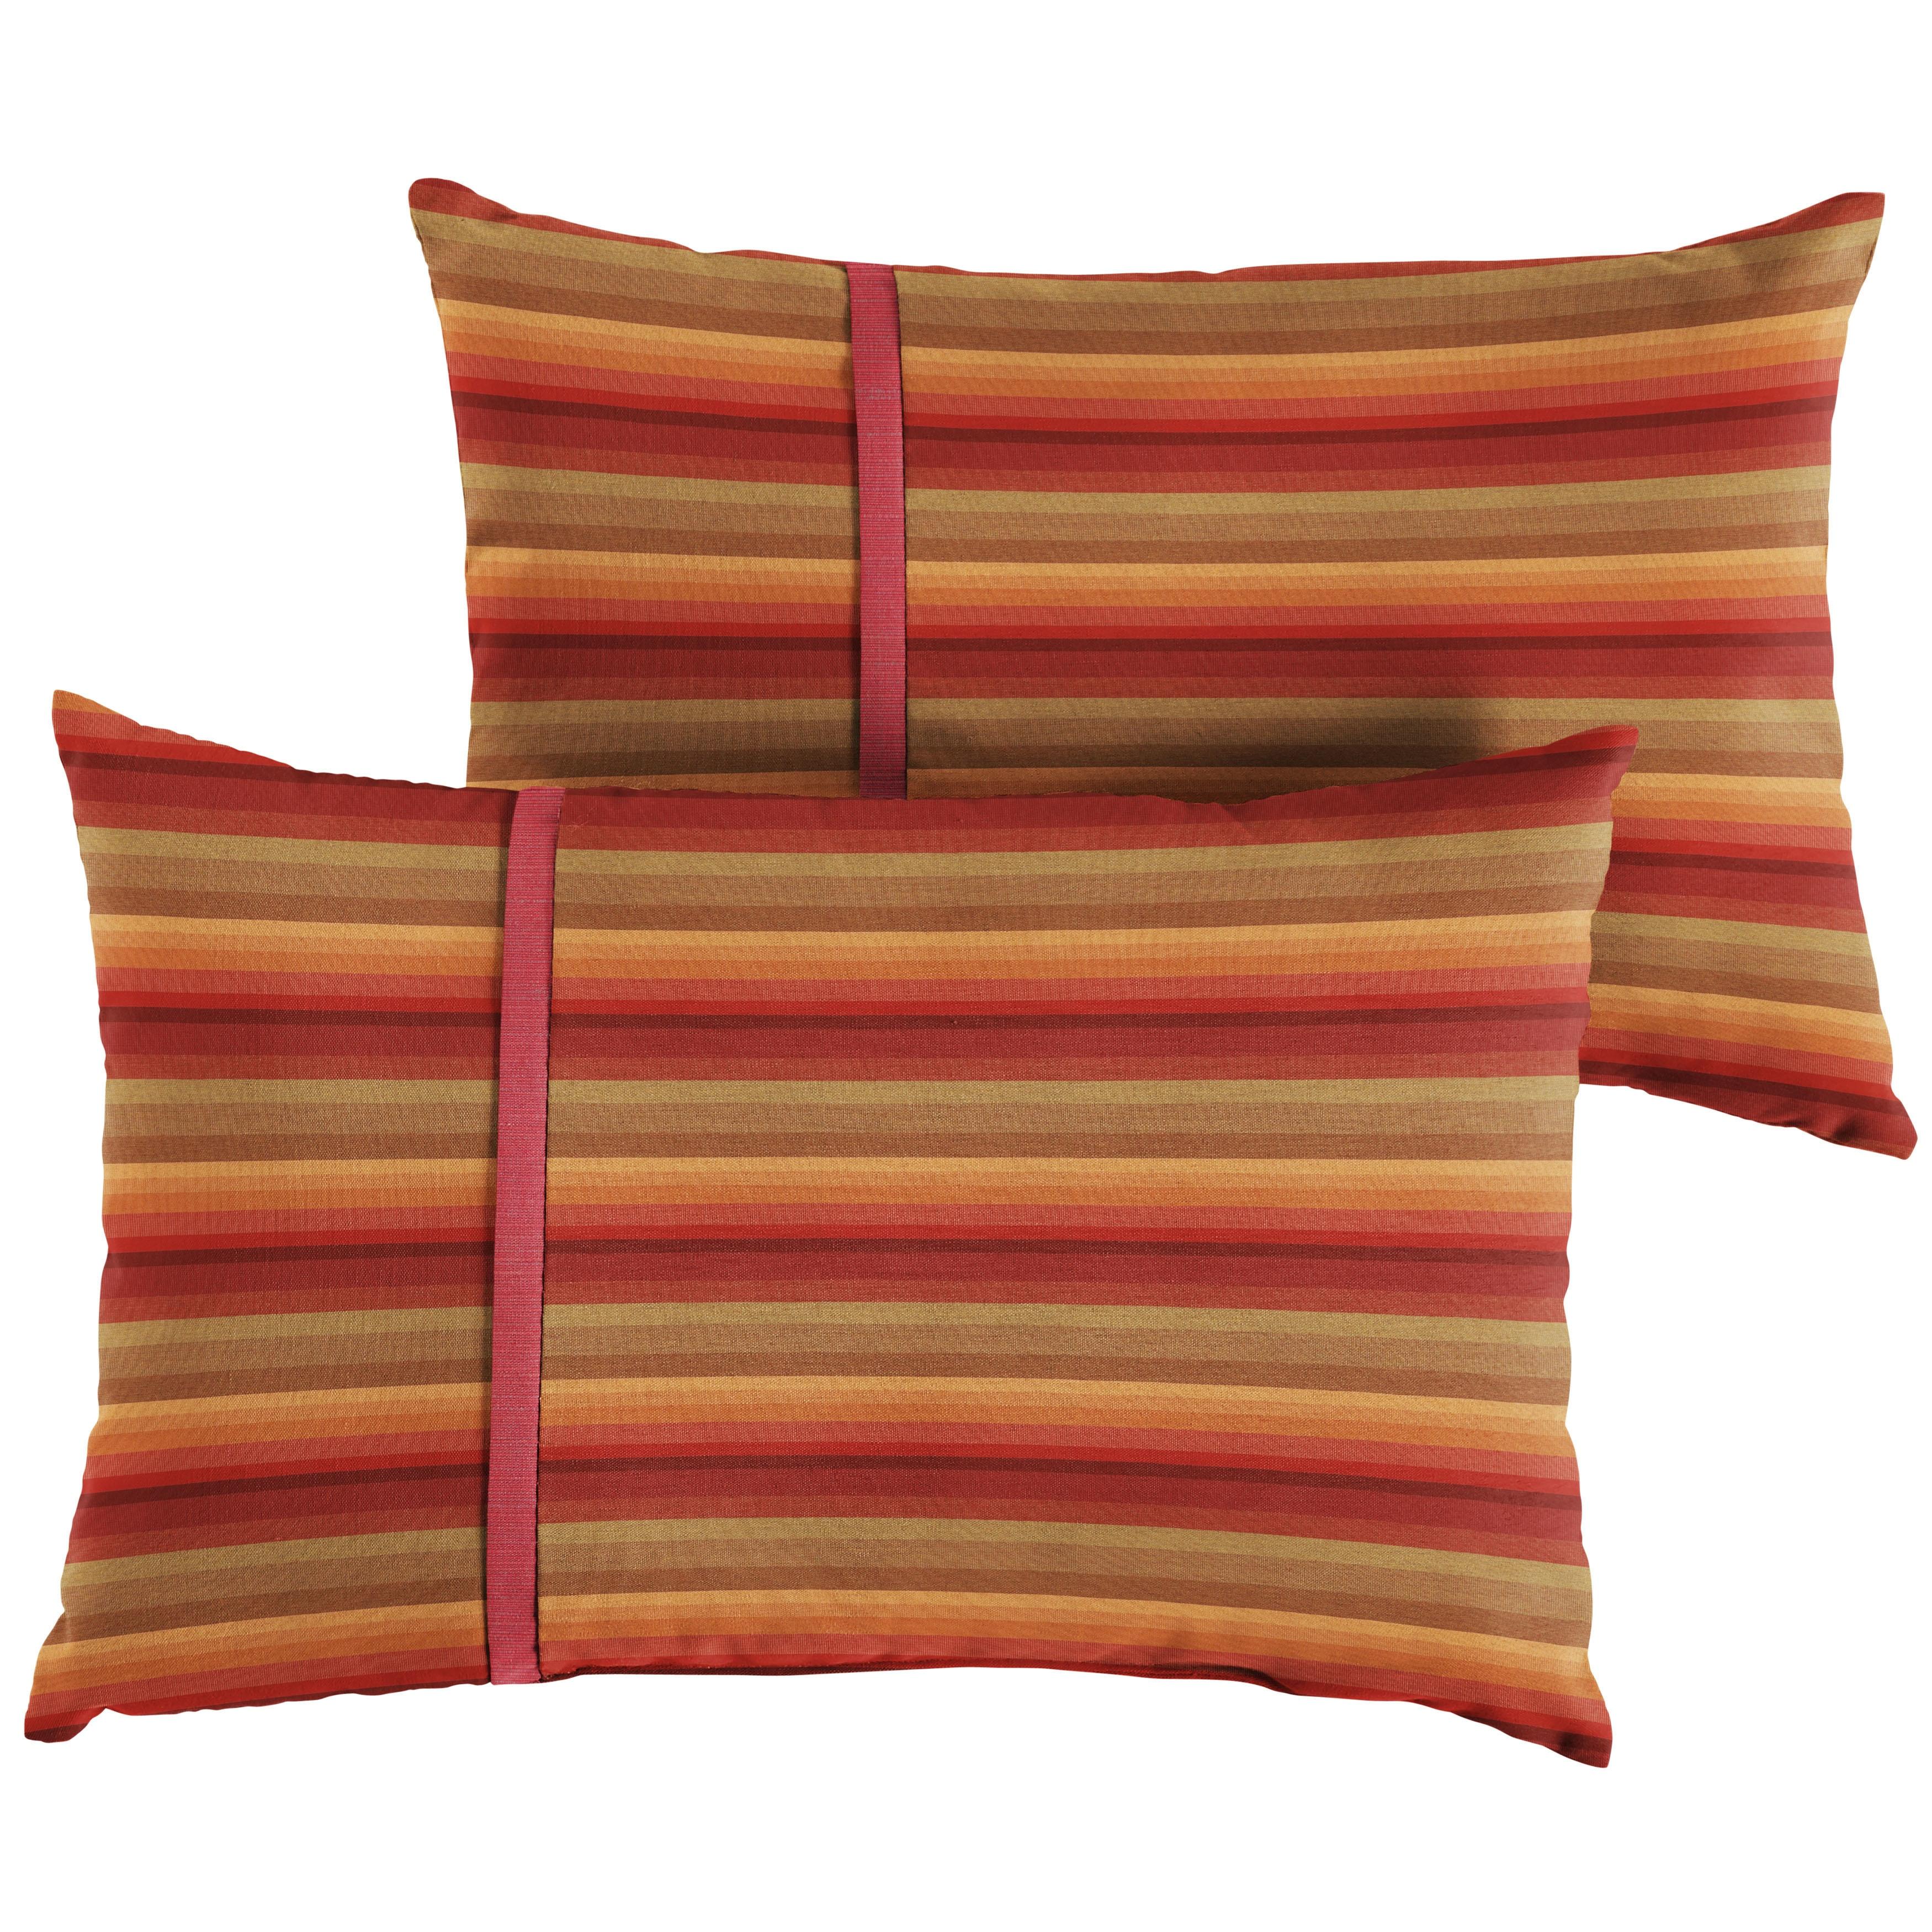 raw products desicrafts red silk gold yeollow and dupioni orange pillow lumber banarasi yellow sunny cover babb lumbar